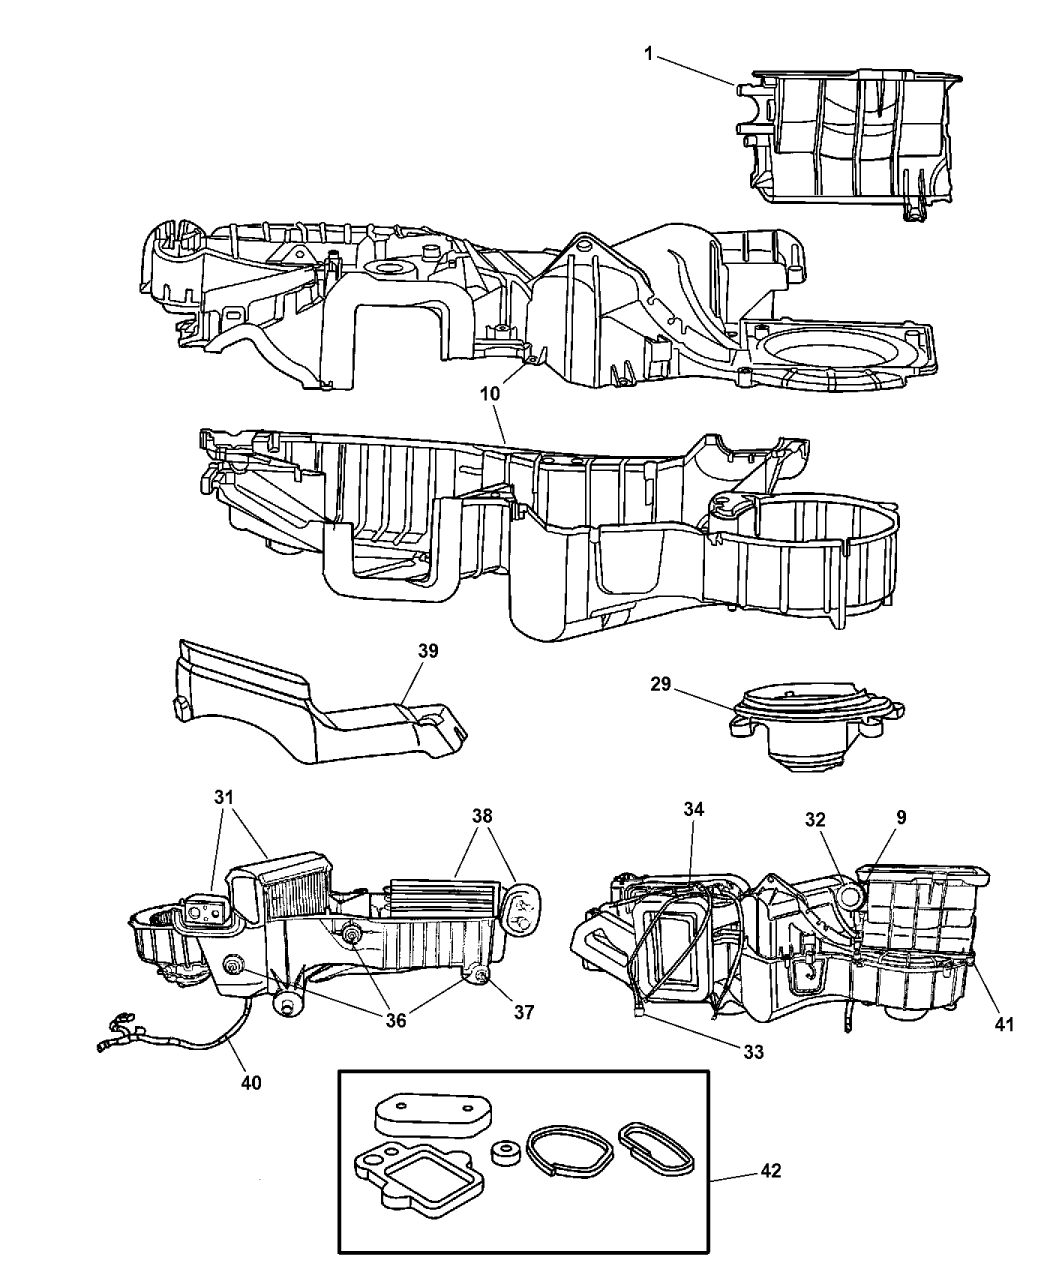 2002 Chrysler PT Cruiser Air Conditioning & Heater Unit